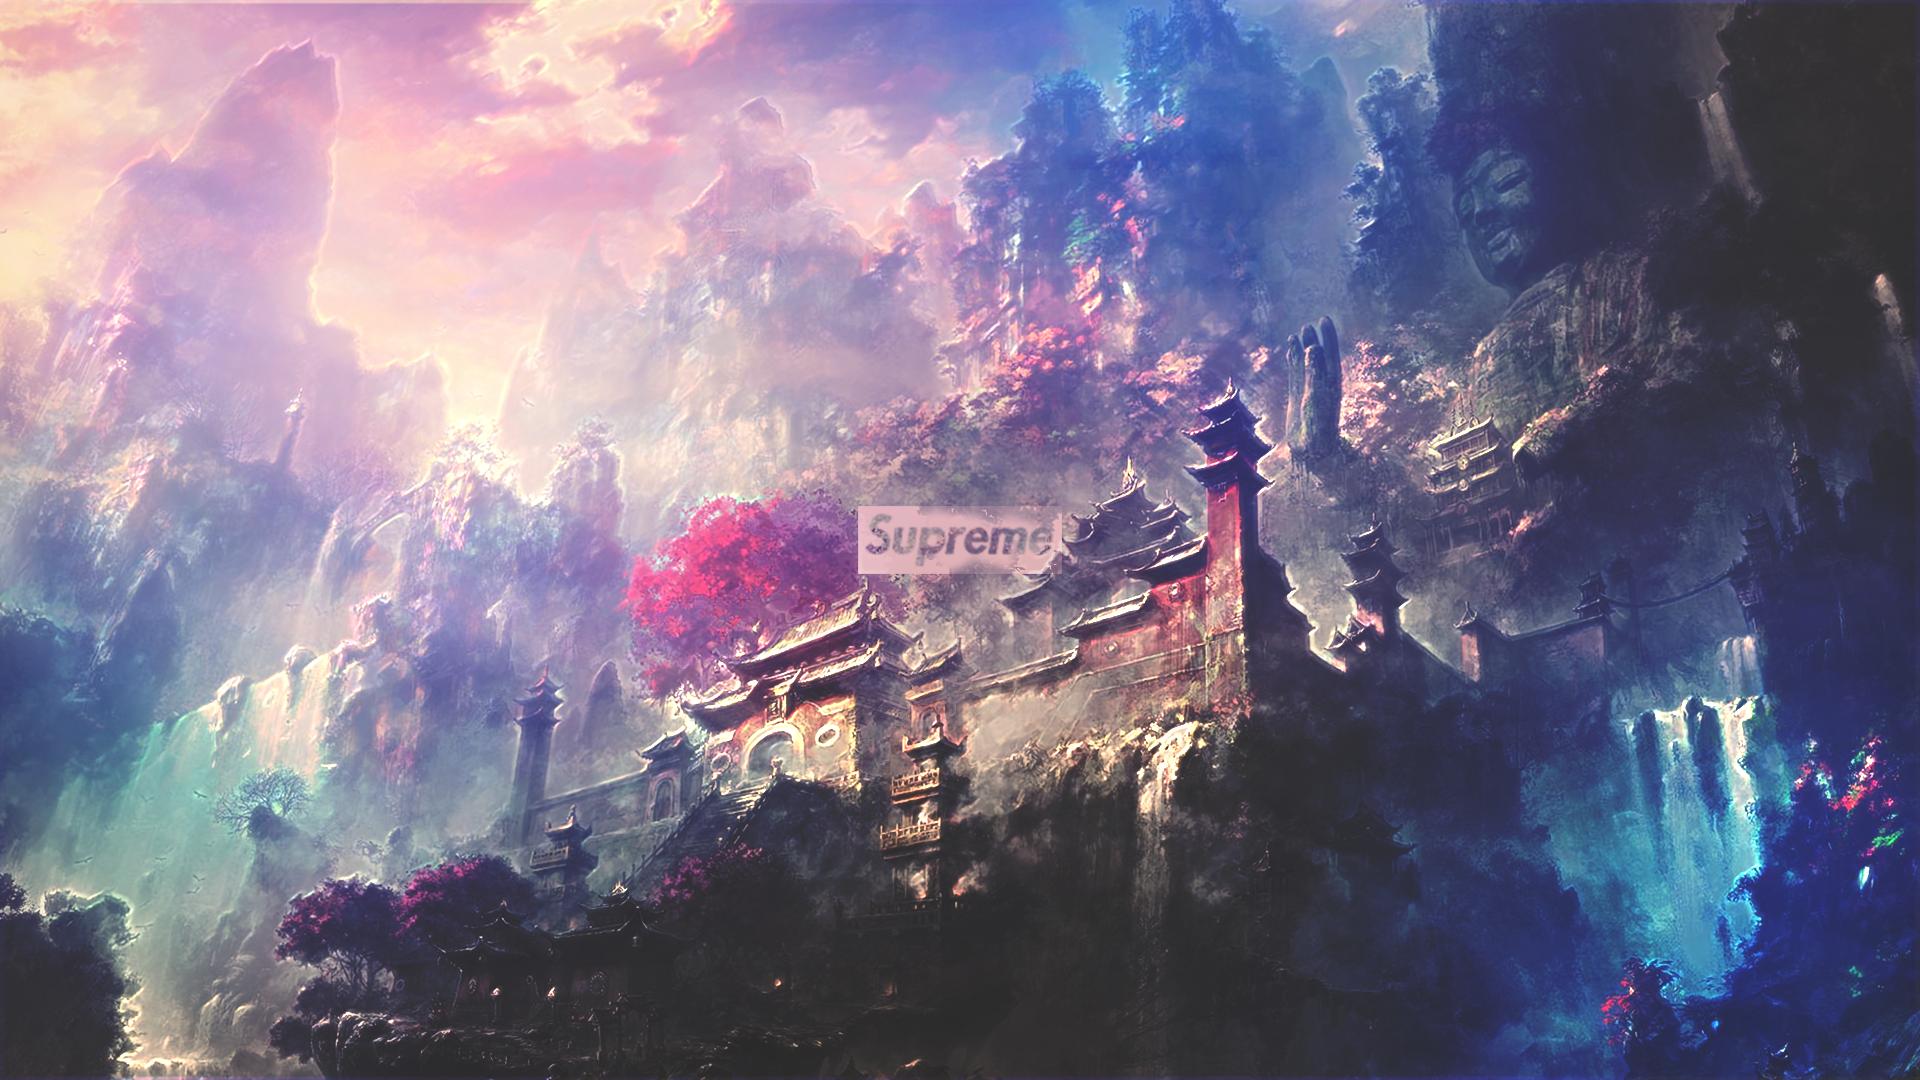 Supreme Temple Desktop Full Hd Wallpaper Hd Wallpaper Background Image 1920x1080 Id 902946 Wallpaper Abyss